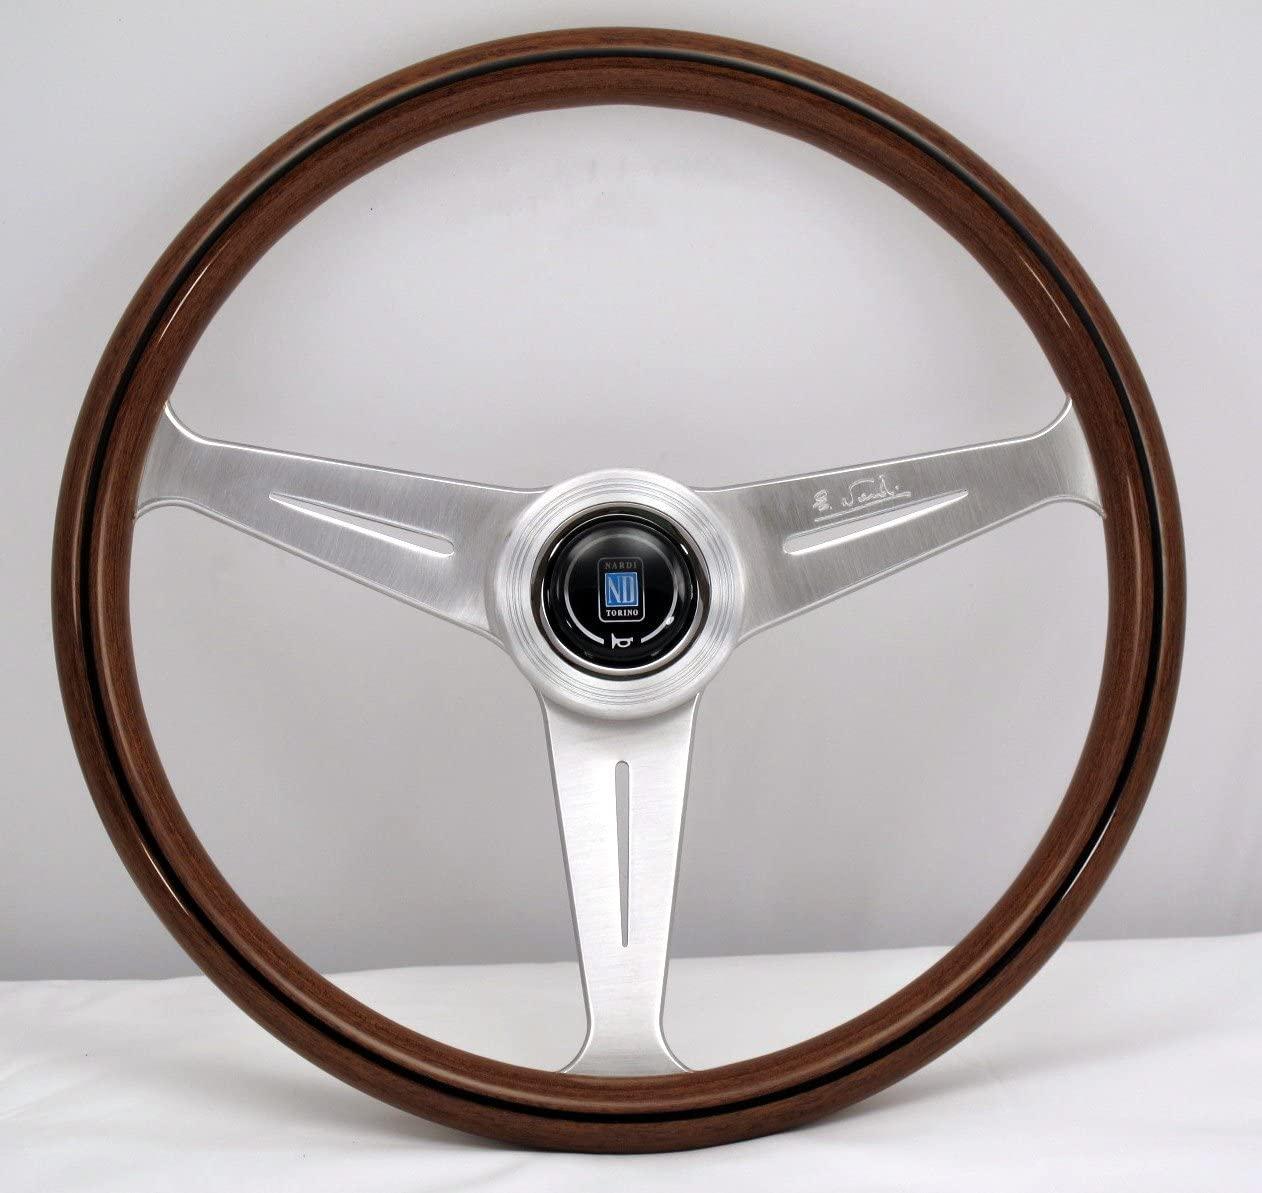 Nardi Steering Wheel - Classic - 390mm (15.35 inches) - Mahogany Wood with Satin Spokes - KBA/ABE 70065 - Part # 5051.39.6300